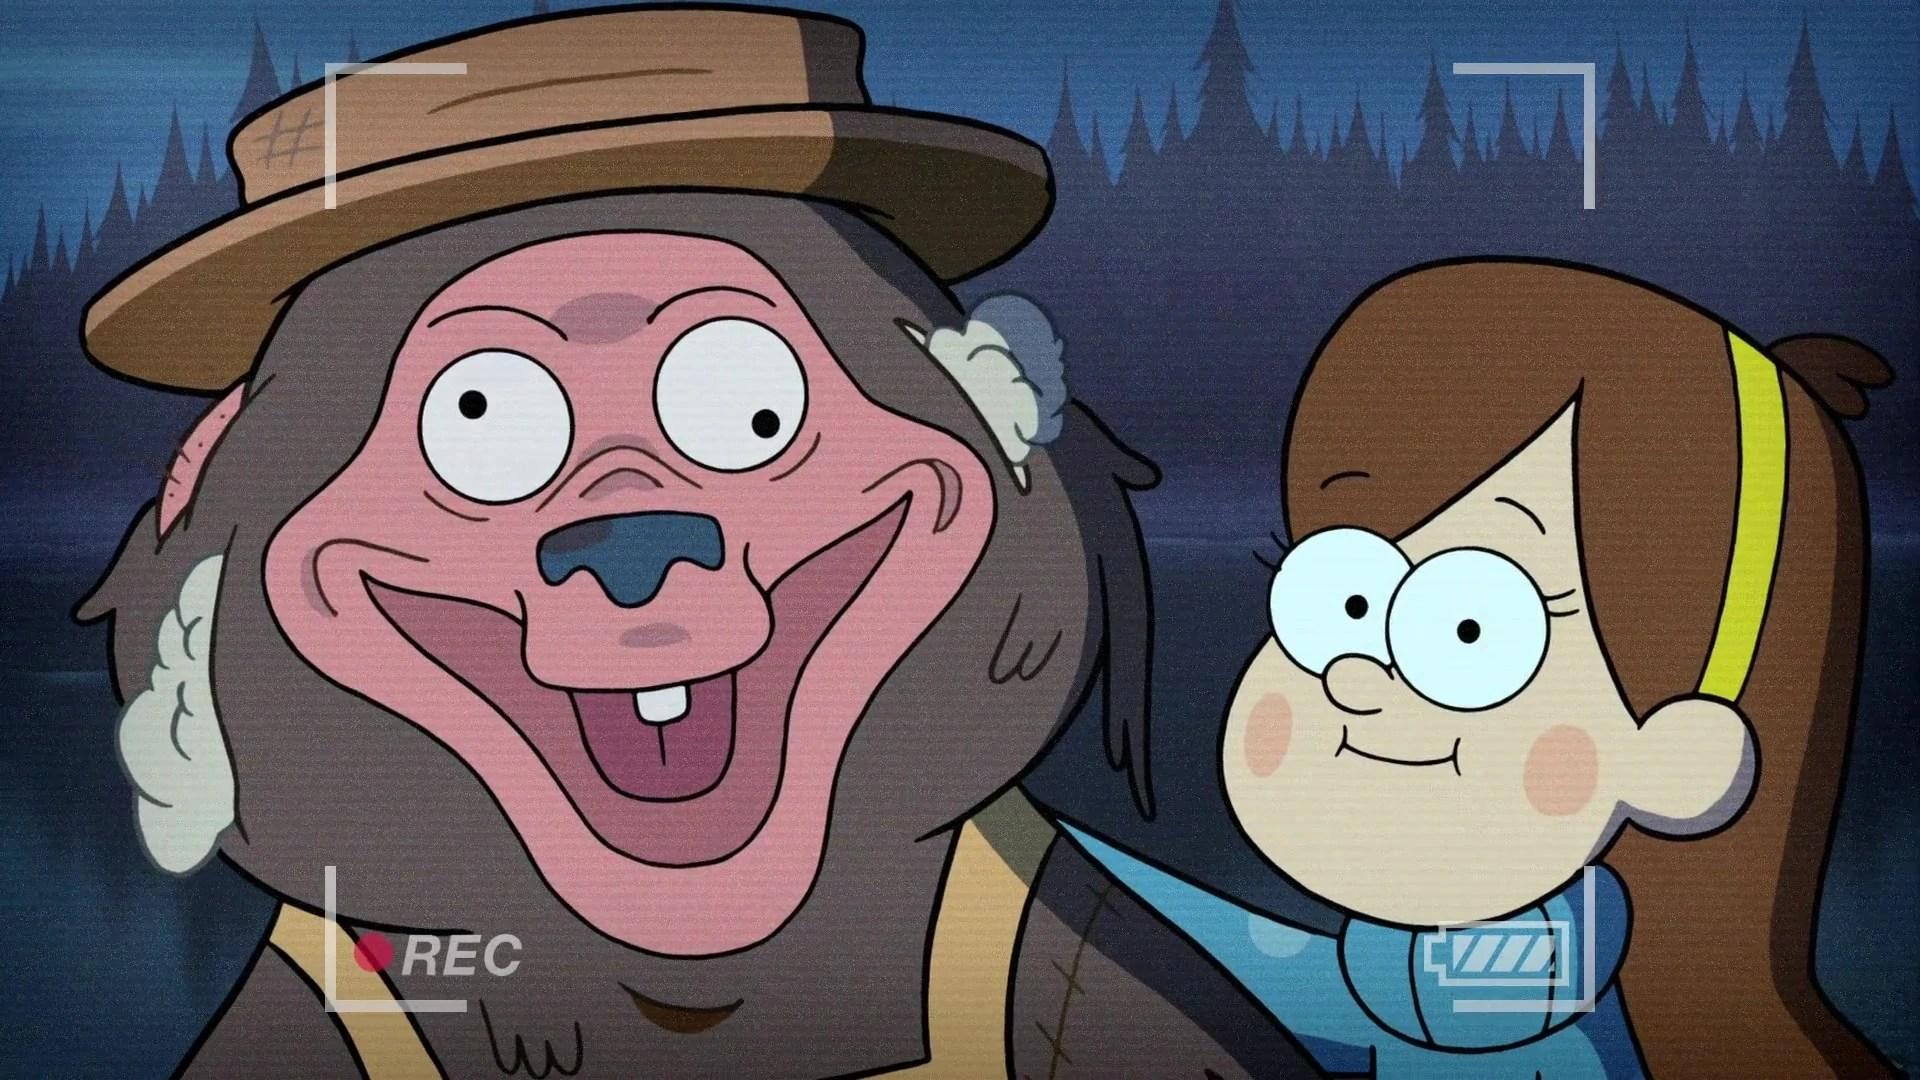 Gravity Falls Waddles Wallpaper Bear O Gravity Falls Wiki Fandom Powered By Wikia